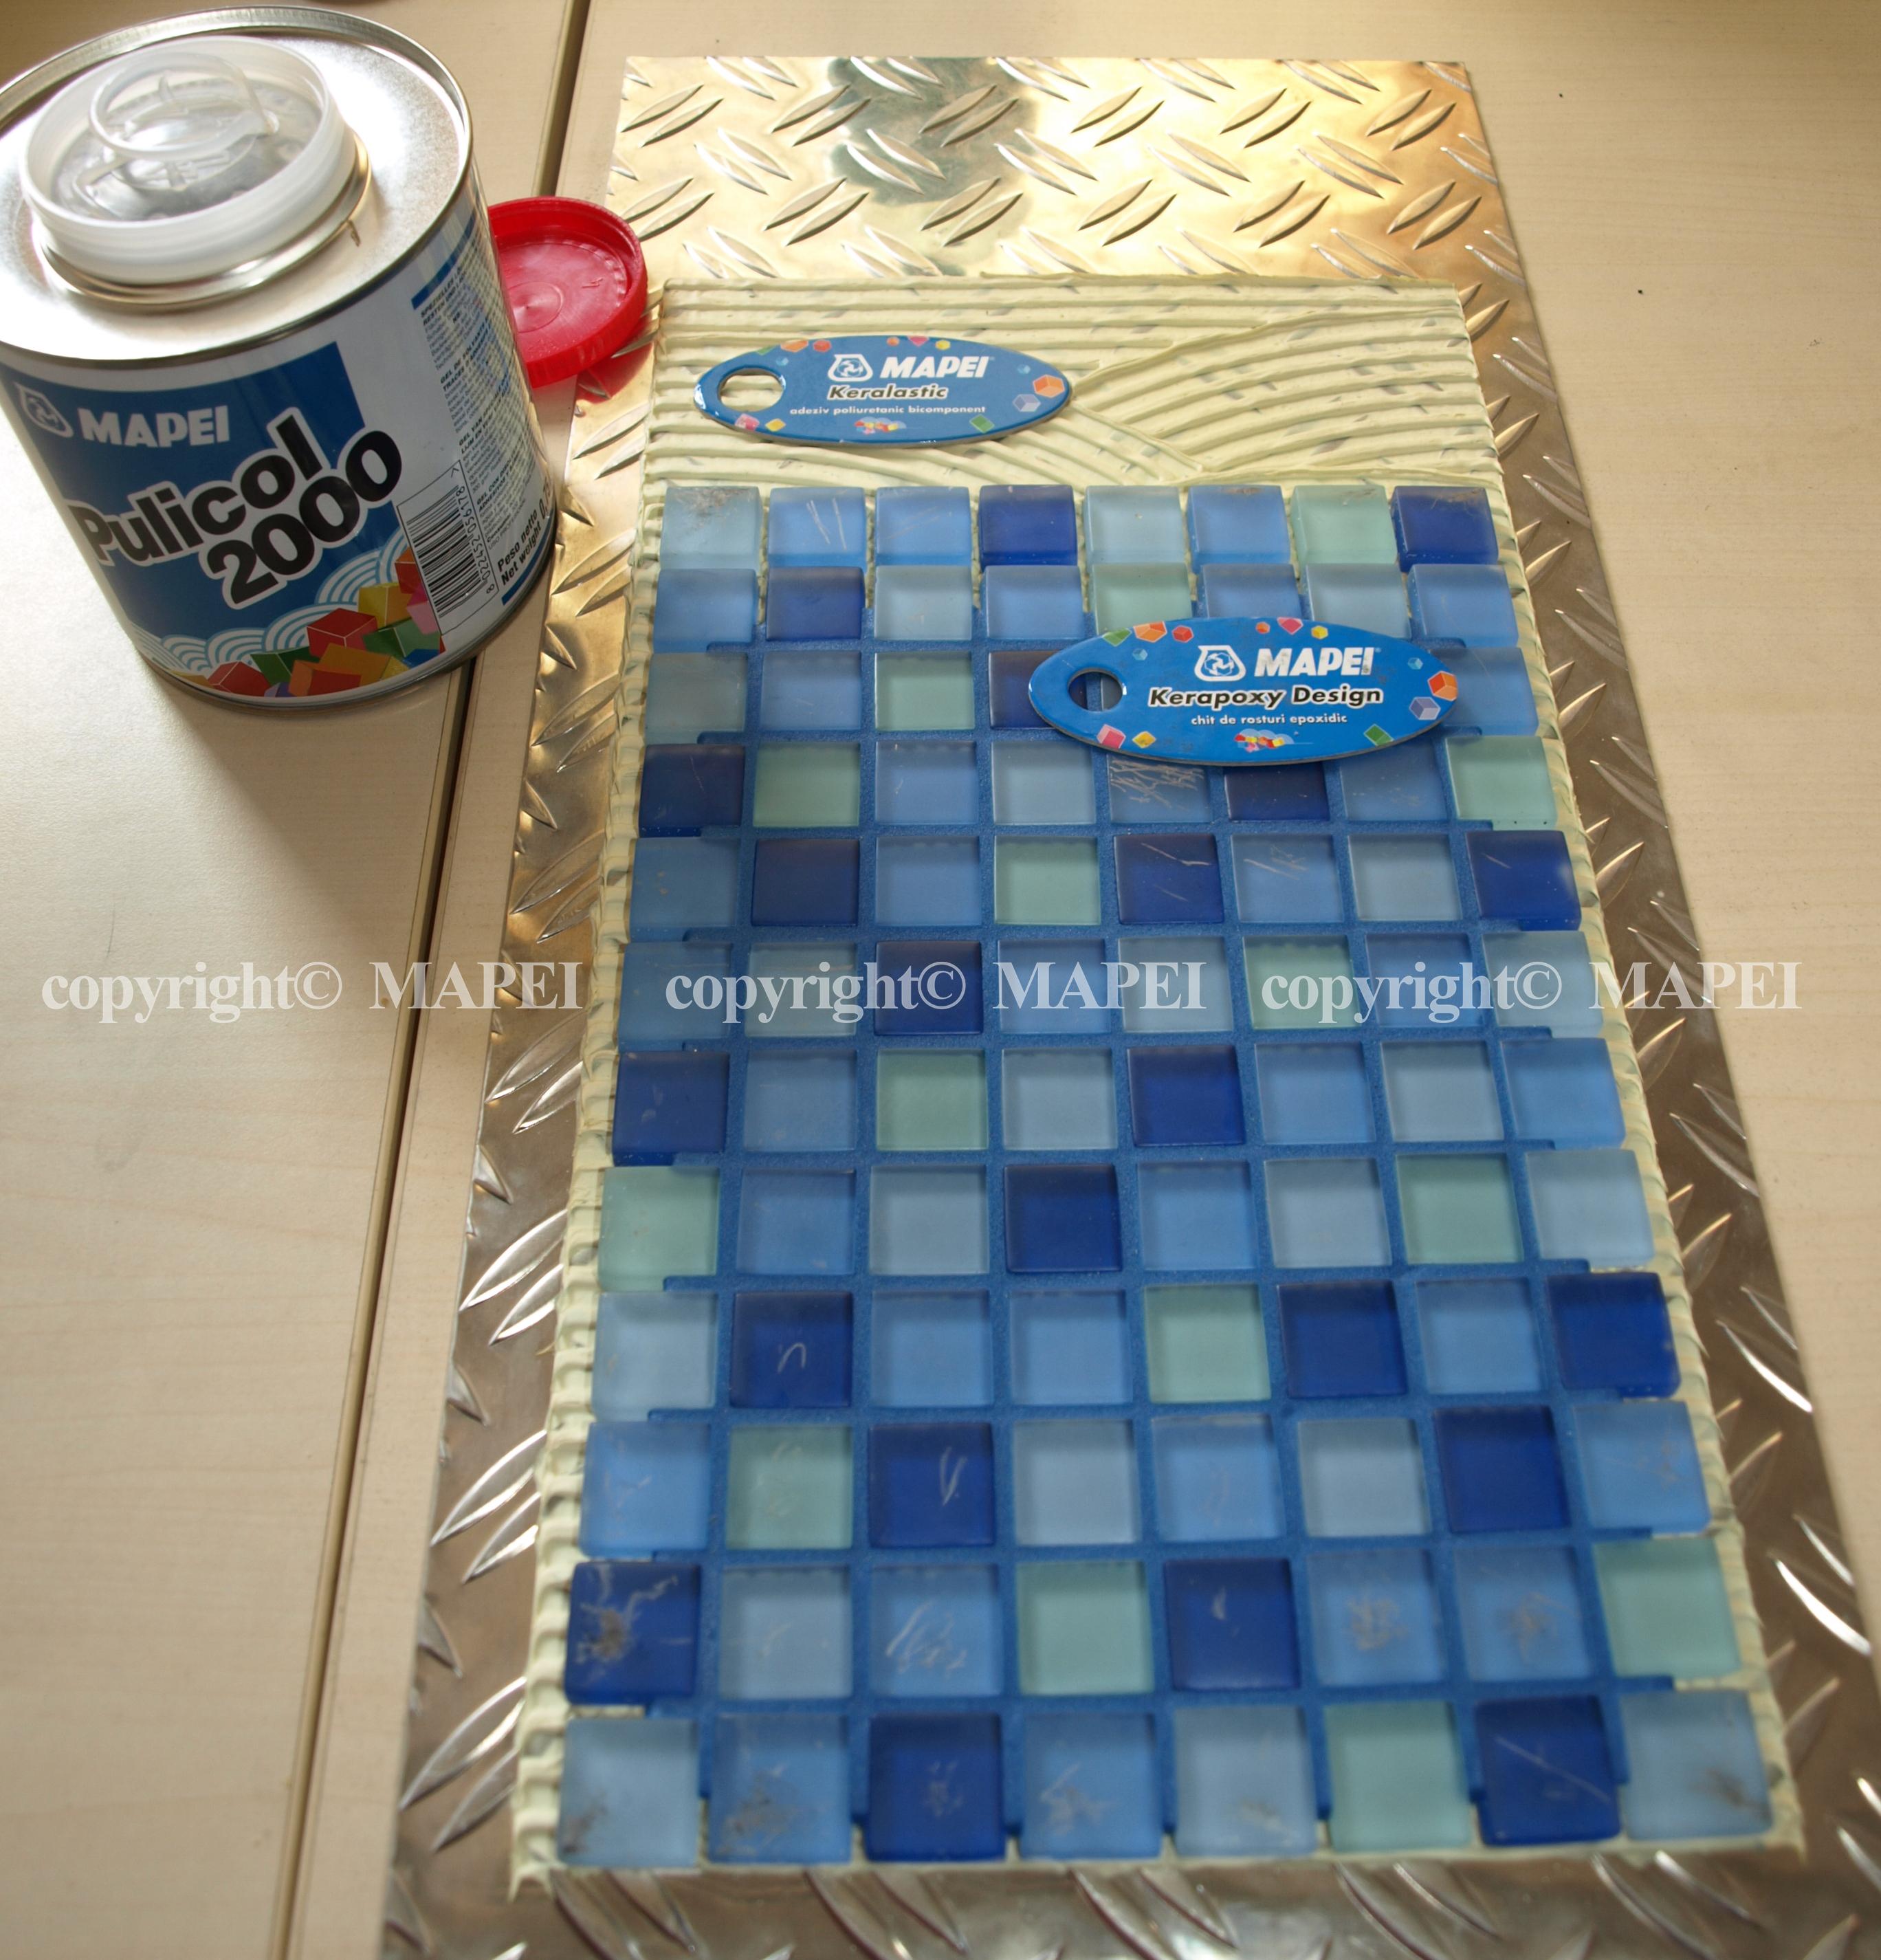 2. lipire mozaic pe metal adeziv poliuretanic MAPEI - Poza 2